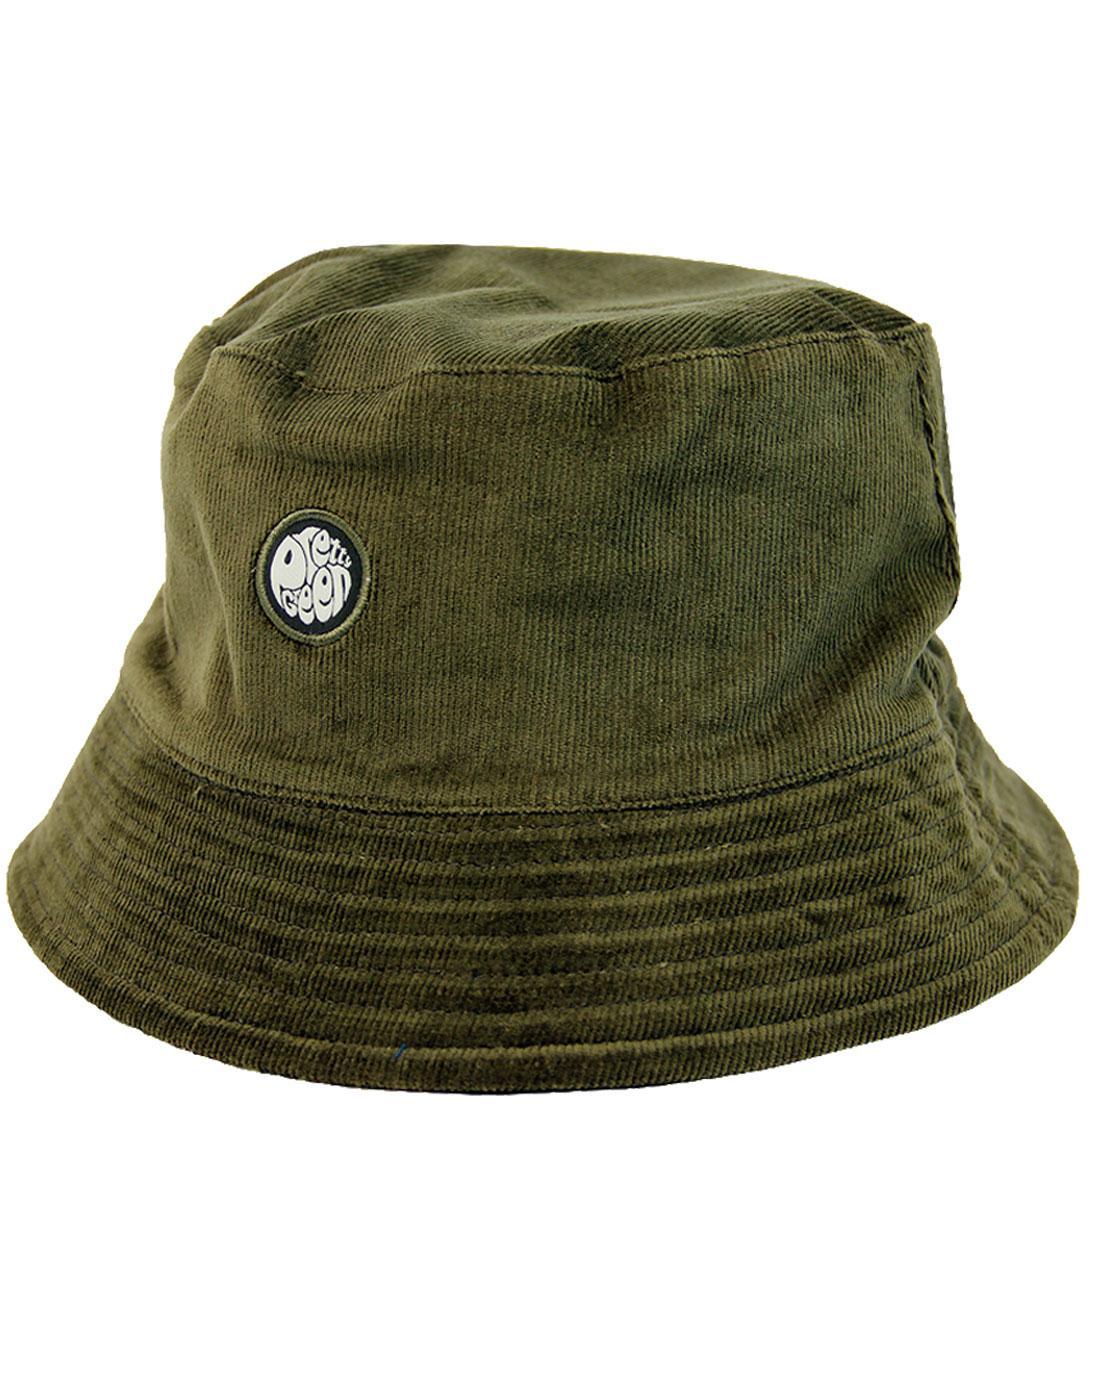 9c5d93033d68b3 PRETTY GREEN Reversible Paisley Retro Indie Bucket Hat in Khaki